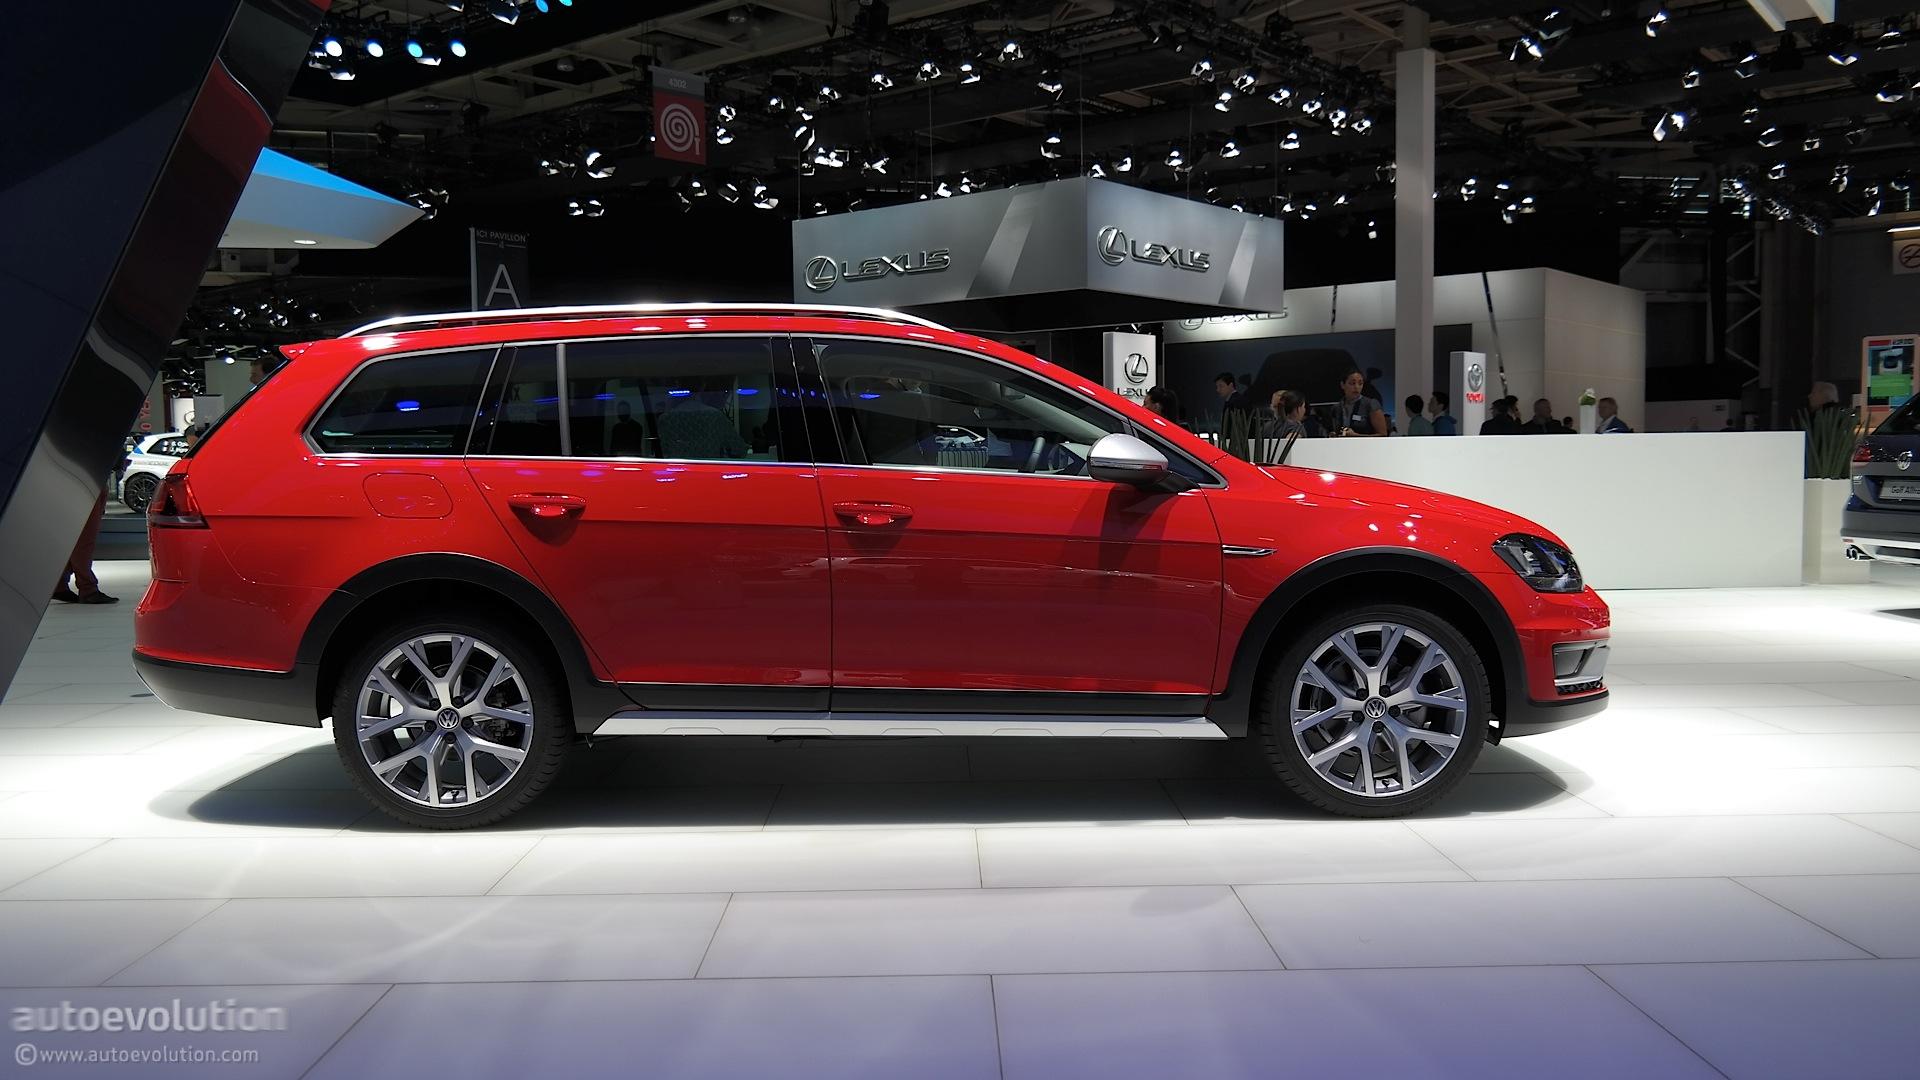 VW Golf SportWagen Alltrack US Debut Confirmed for 2016 ...